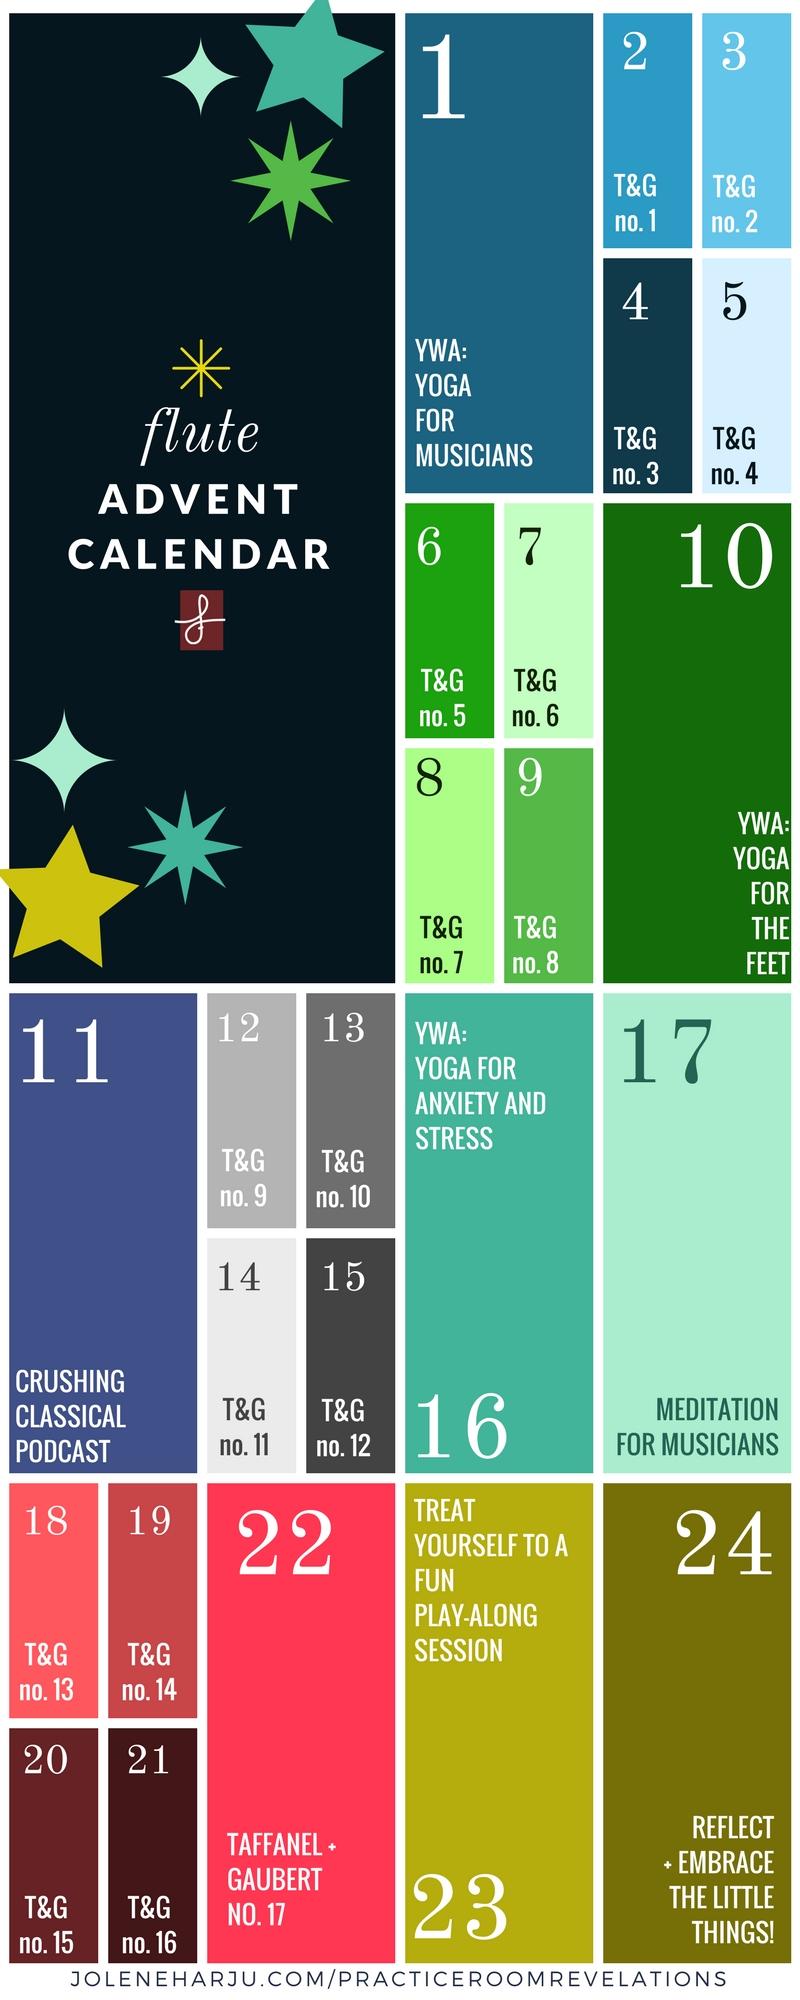 Flute Advent Calendar.jpg